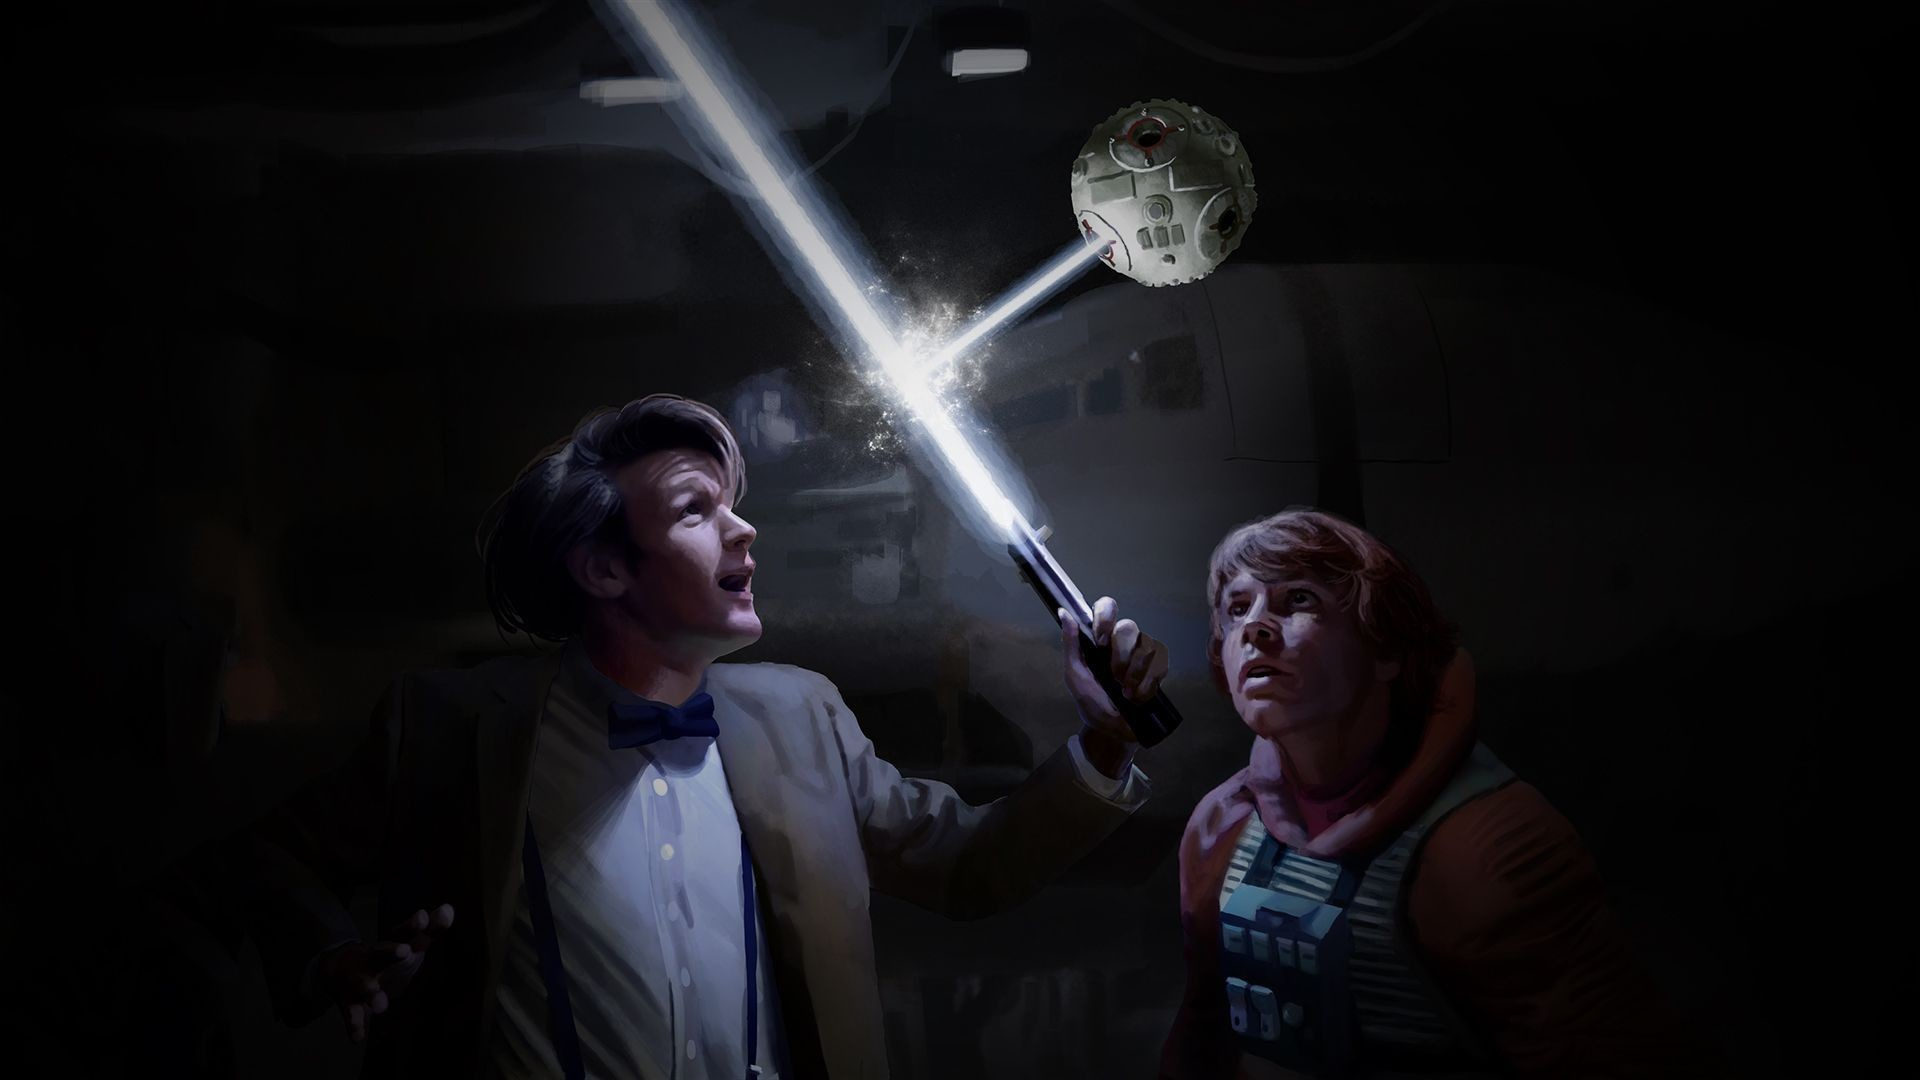 star wars luke skywalker wallpaper (72+ images)